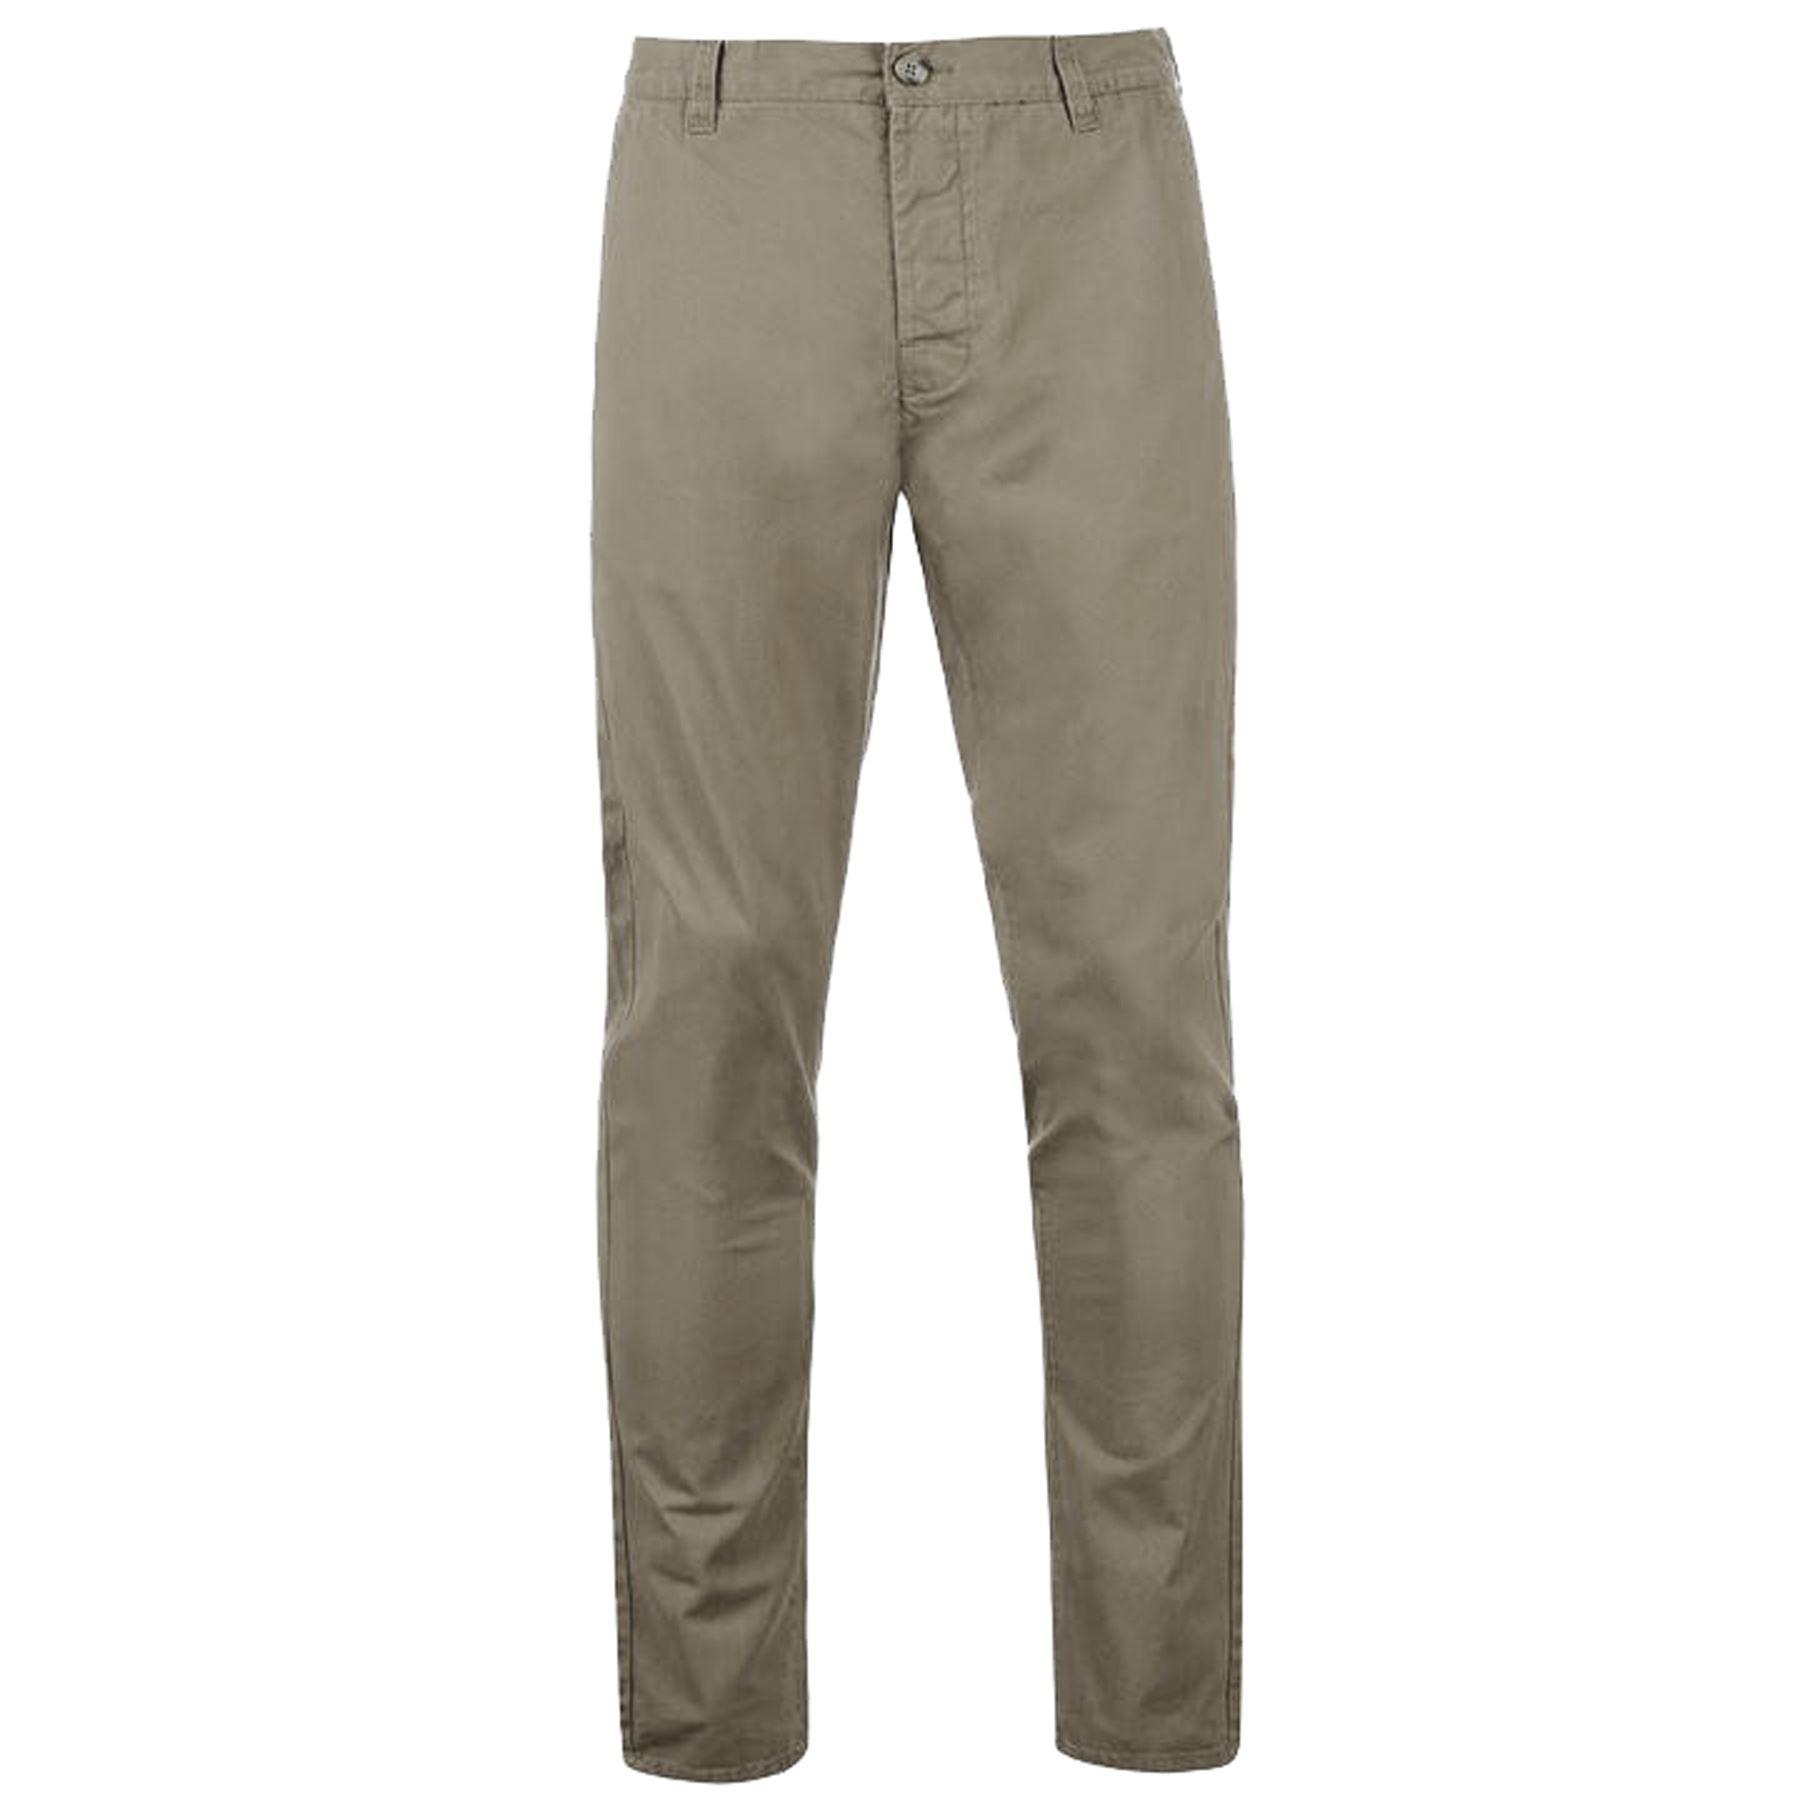 Da-Uomo-Kangol-Pantaloni-chino-regular-fit-straight-leg-in-cotone-Casual-Jeans-Pantaloni